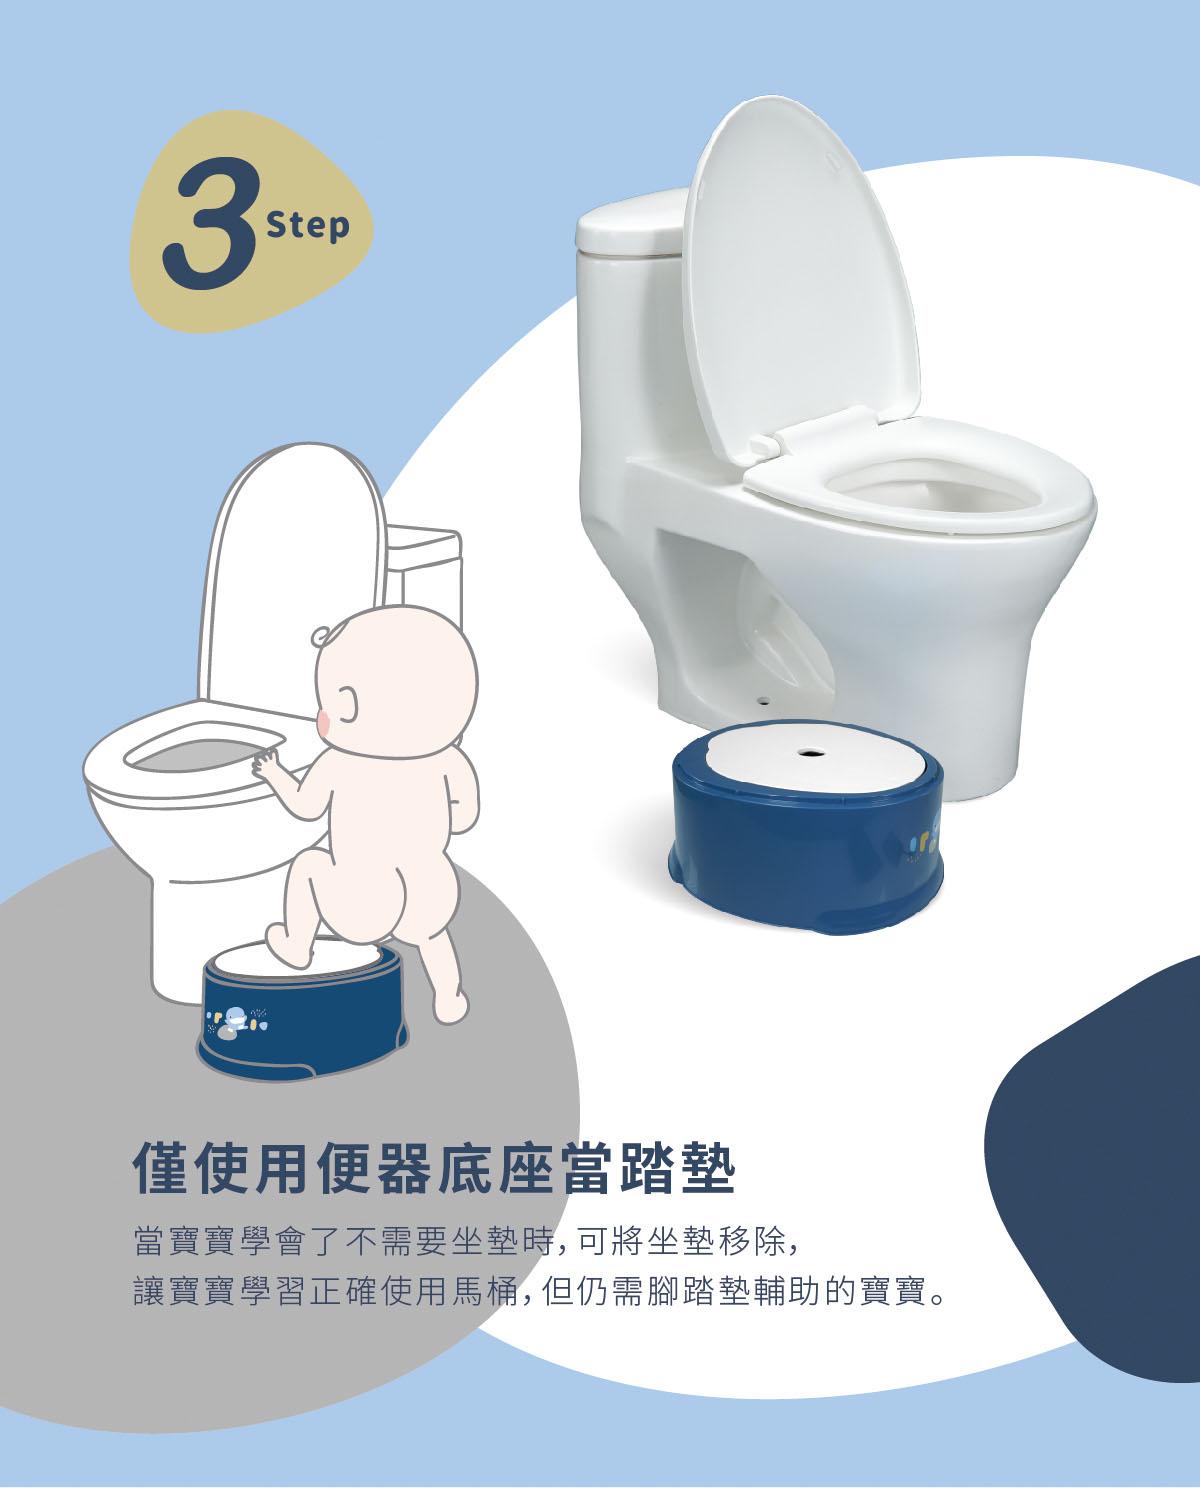 proimages/Bathing&CleanSeries/potty/1137/1137-EDM-5.jpg